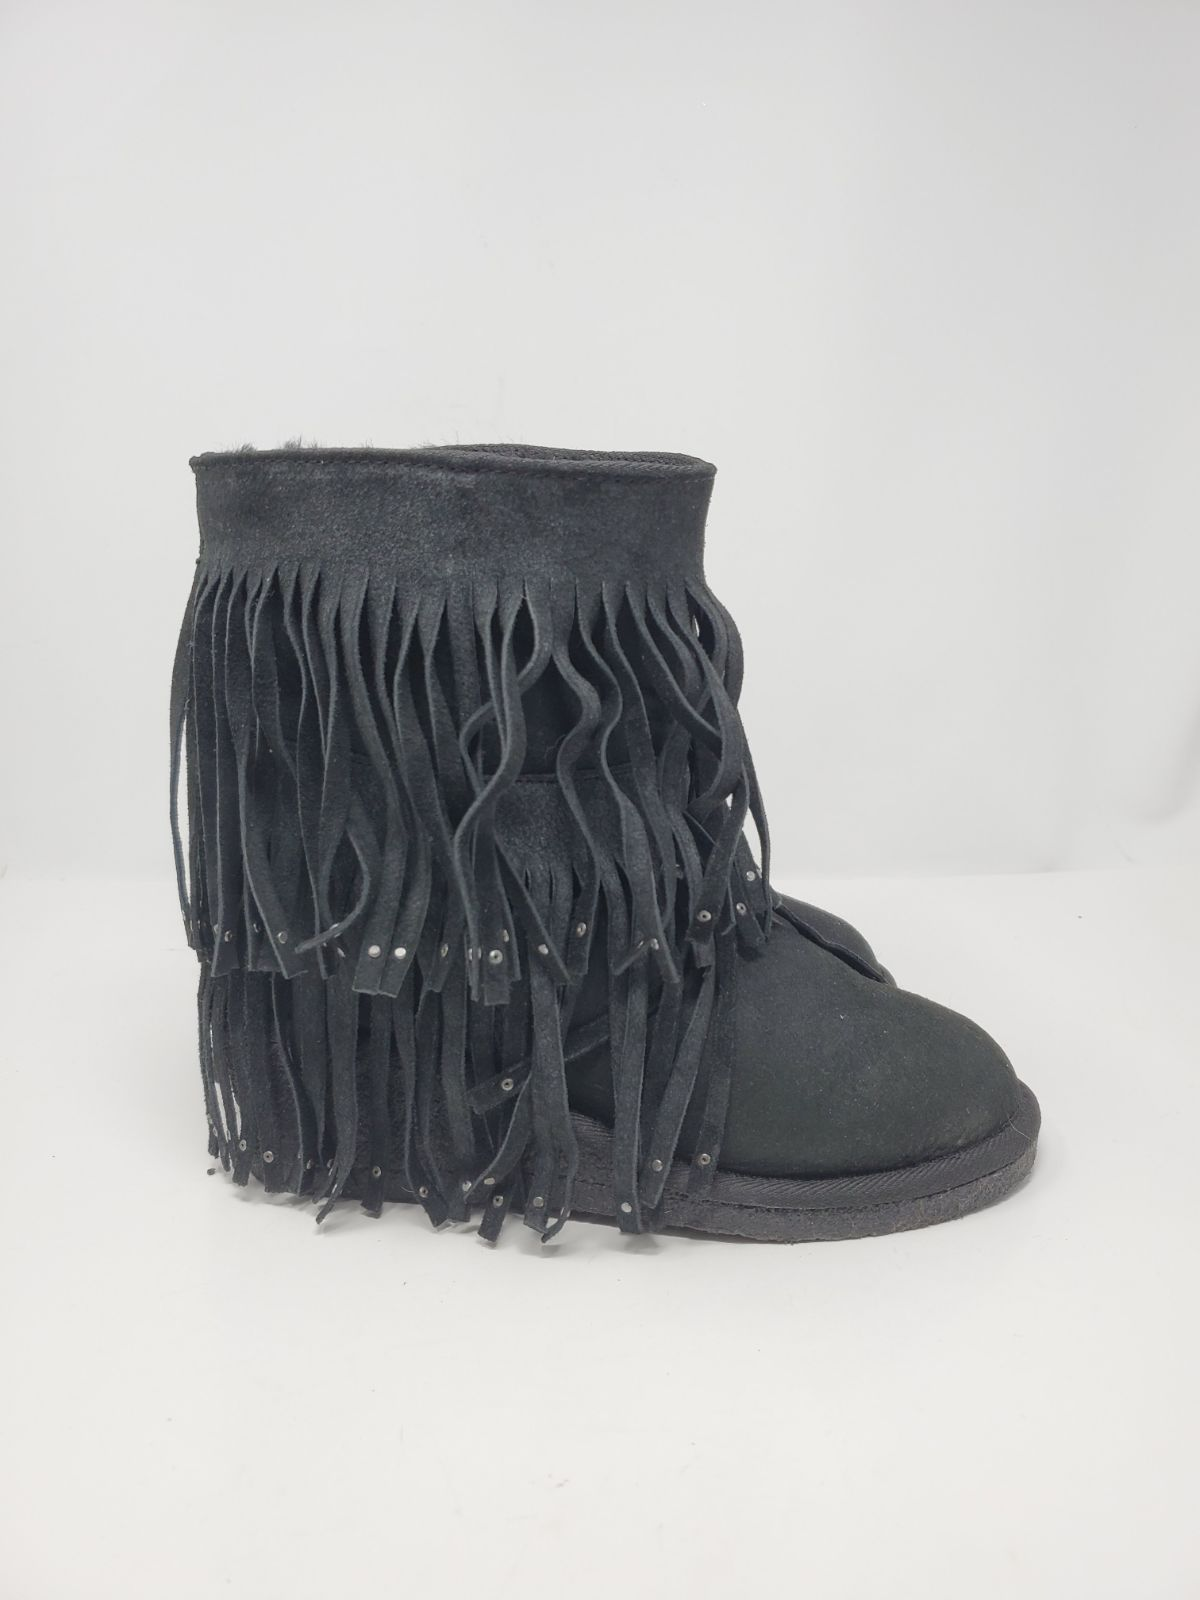 Koolaburra black leather suede boots